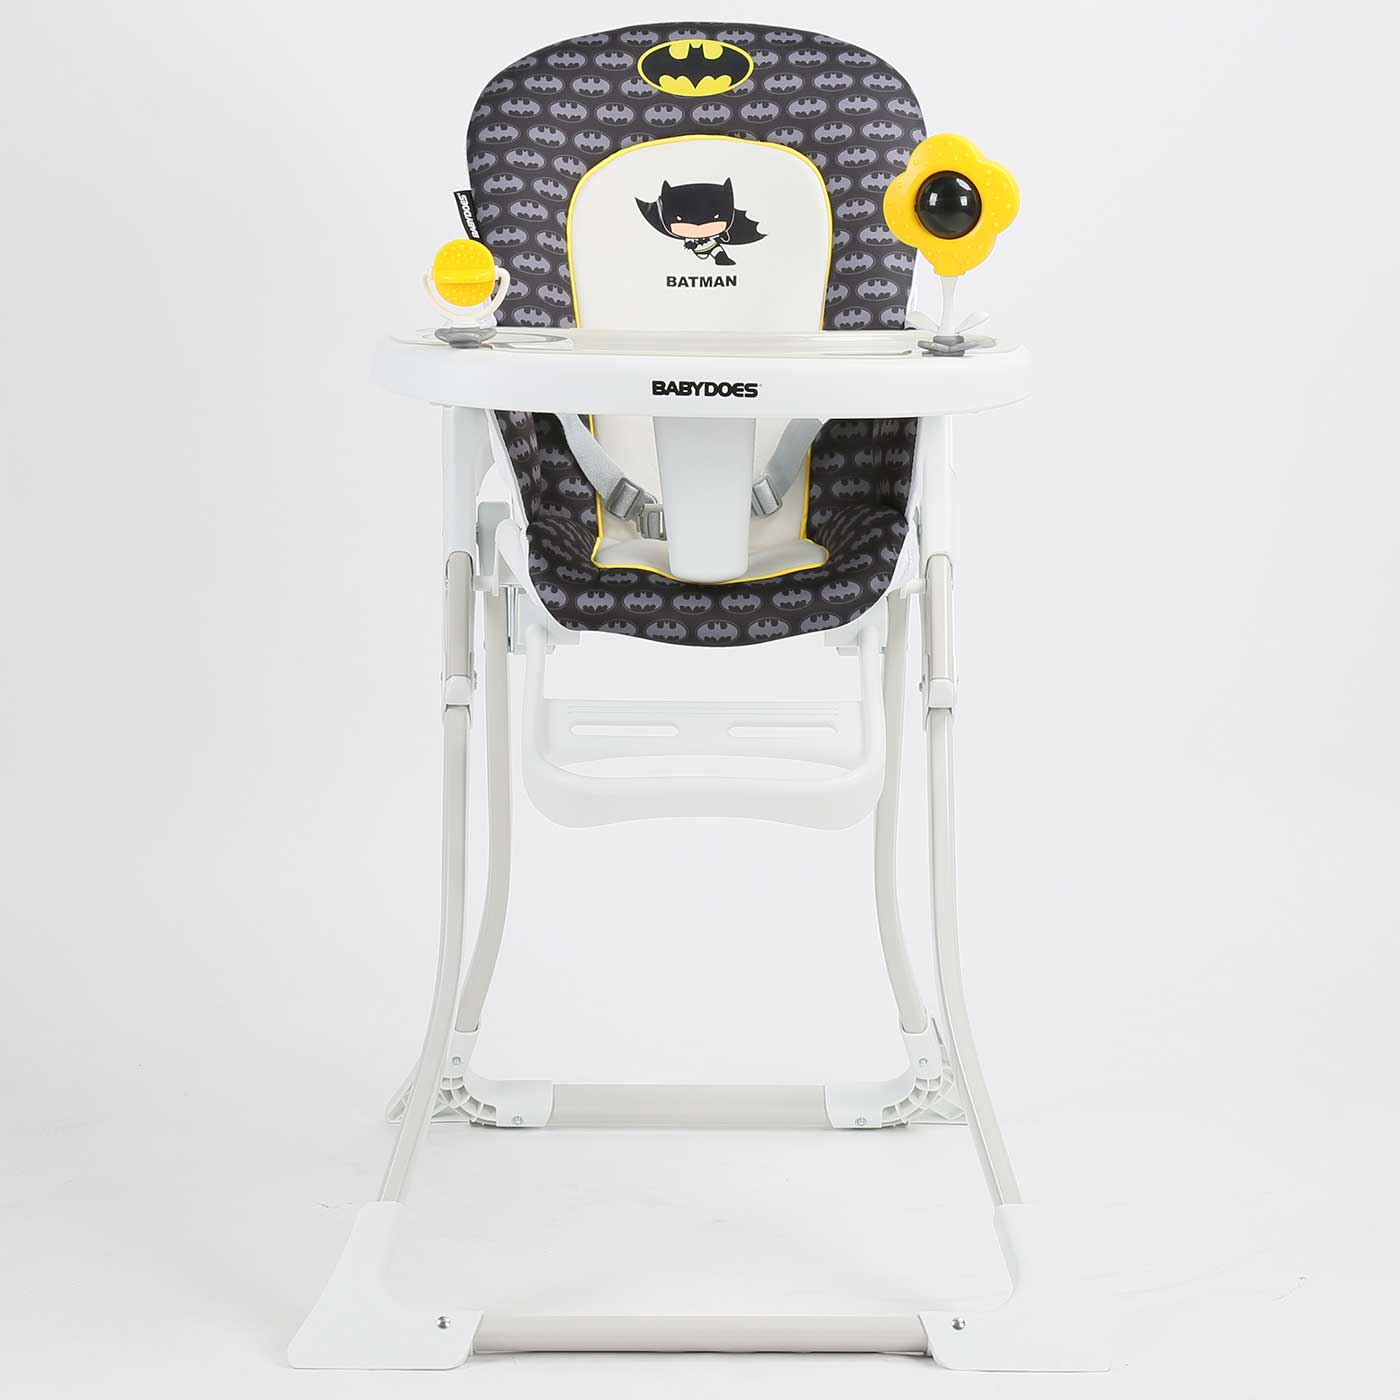 Babydoes - High Chair DCJL BP 043 Justice League Black